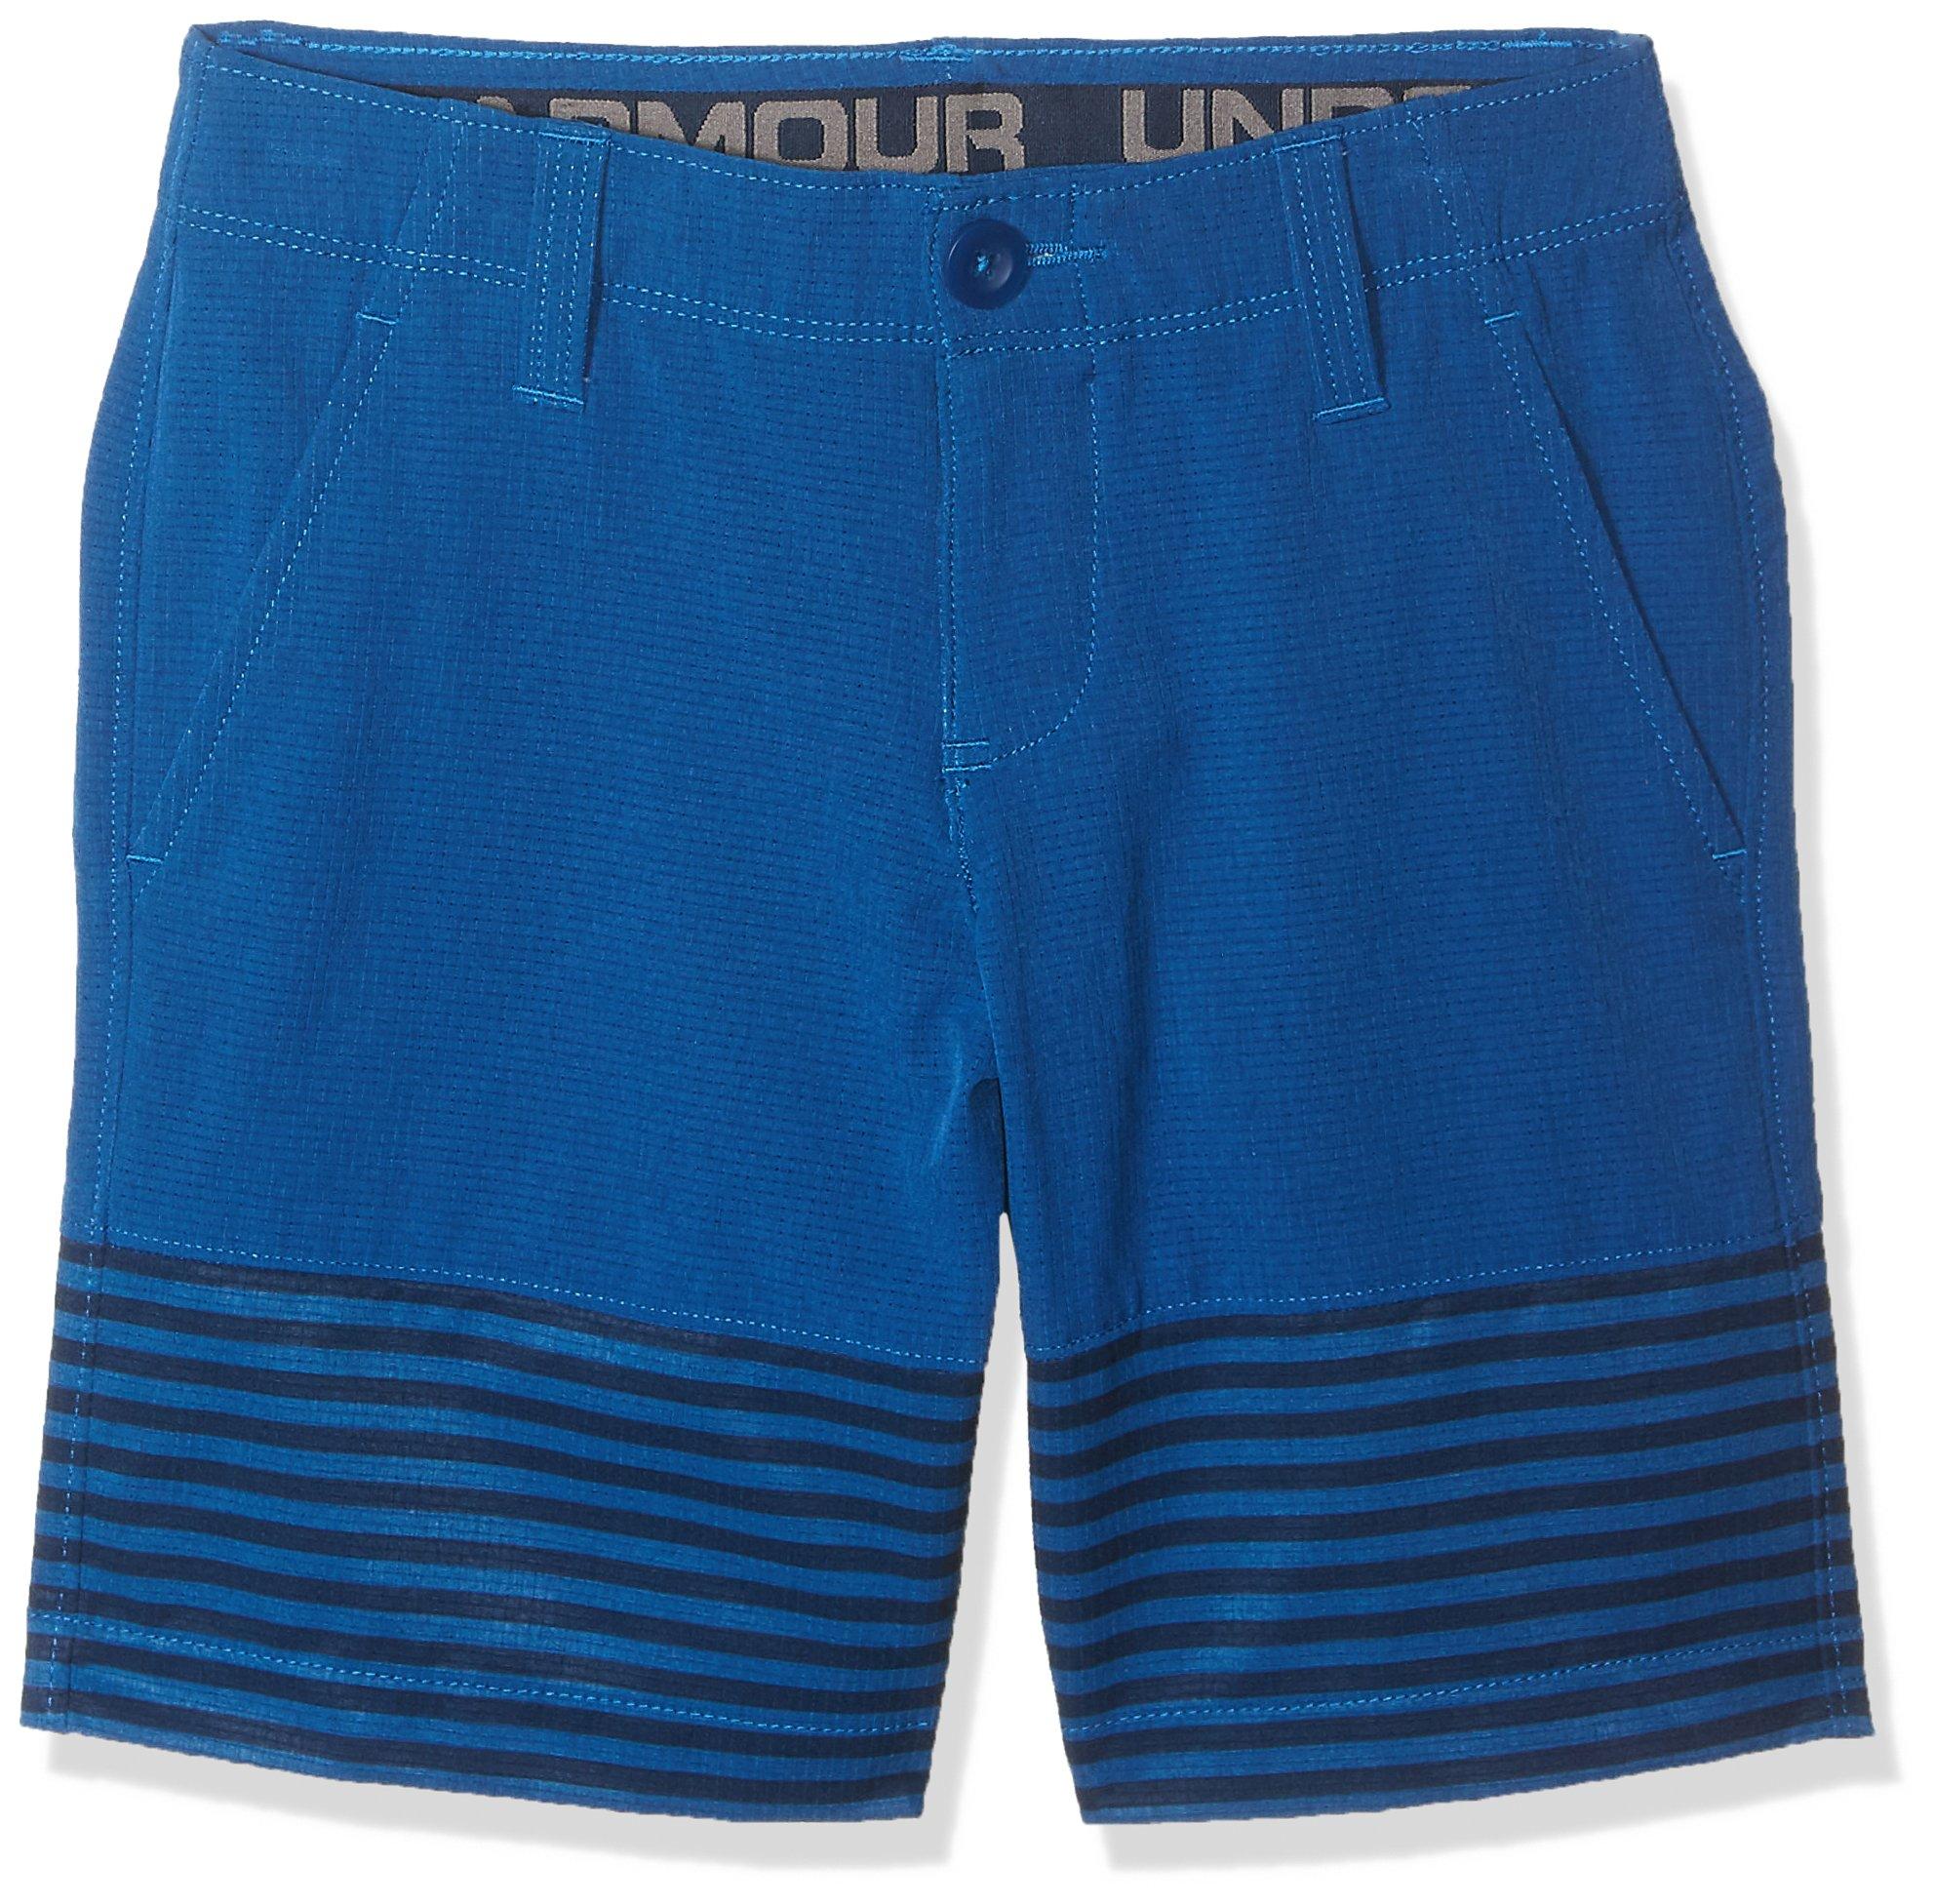 Under Armour Boys Mp Vented Nov Shorts, Moroccan Blue (487)/Moroccan Blue, 14 by Under Armour